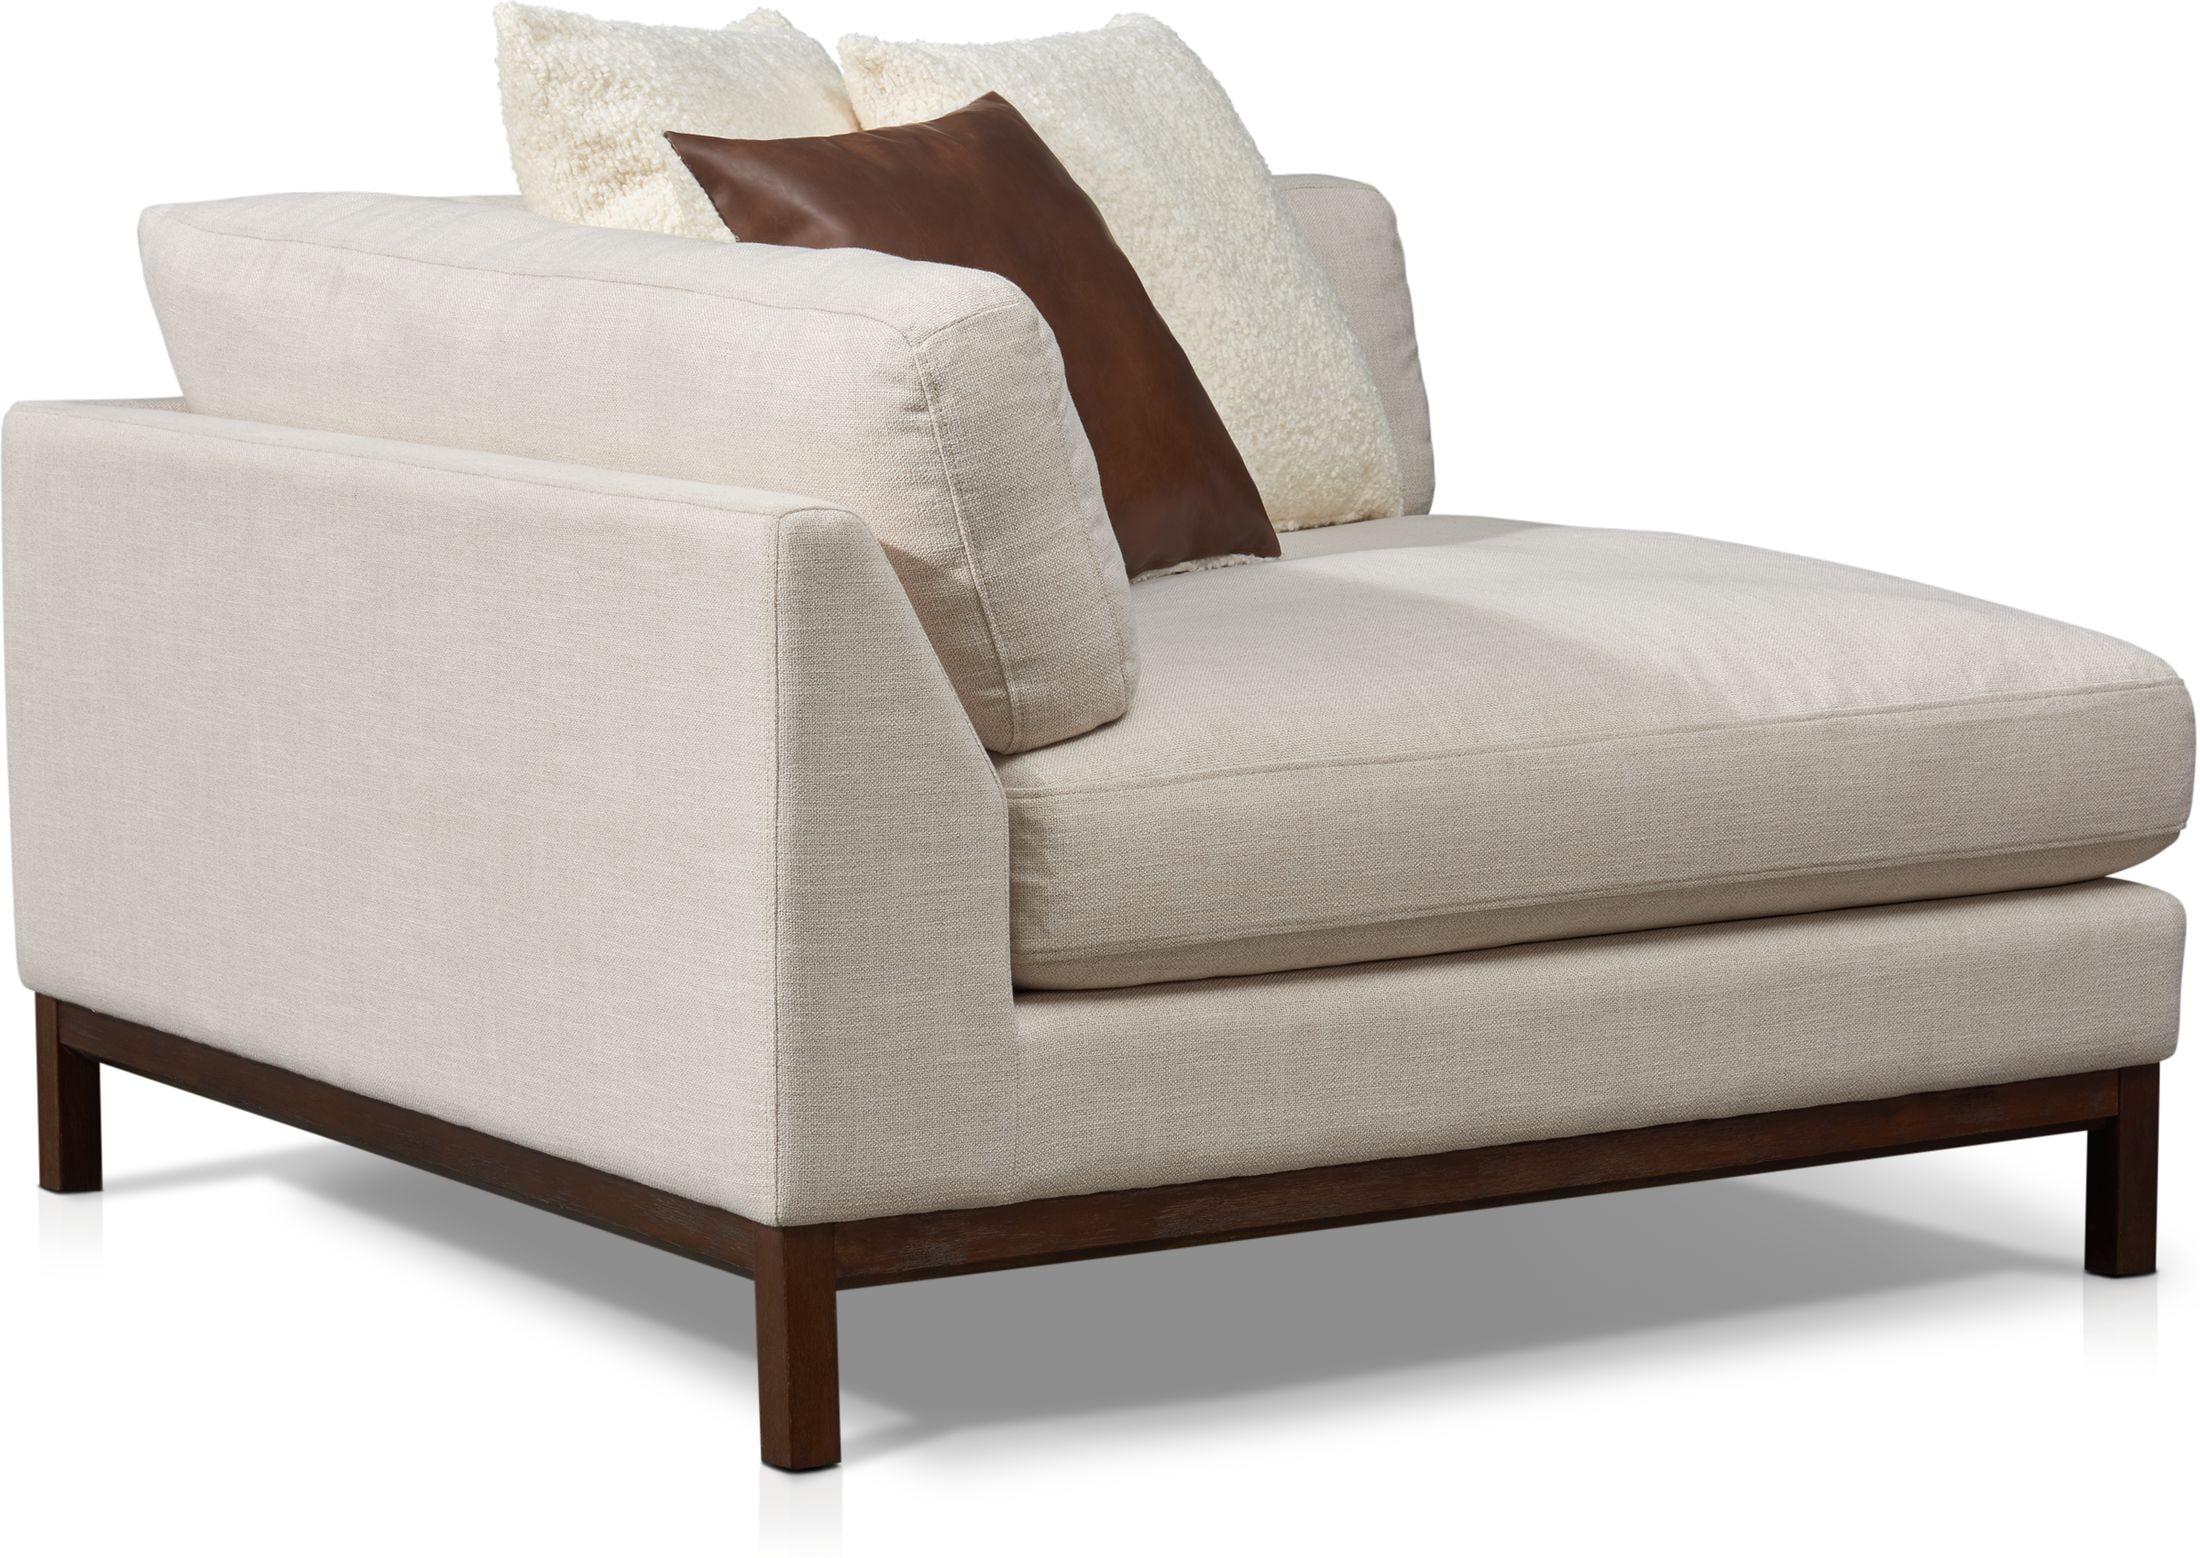 Living Room Furniture - Big Sur Corner Chair